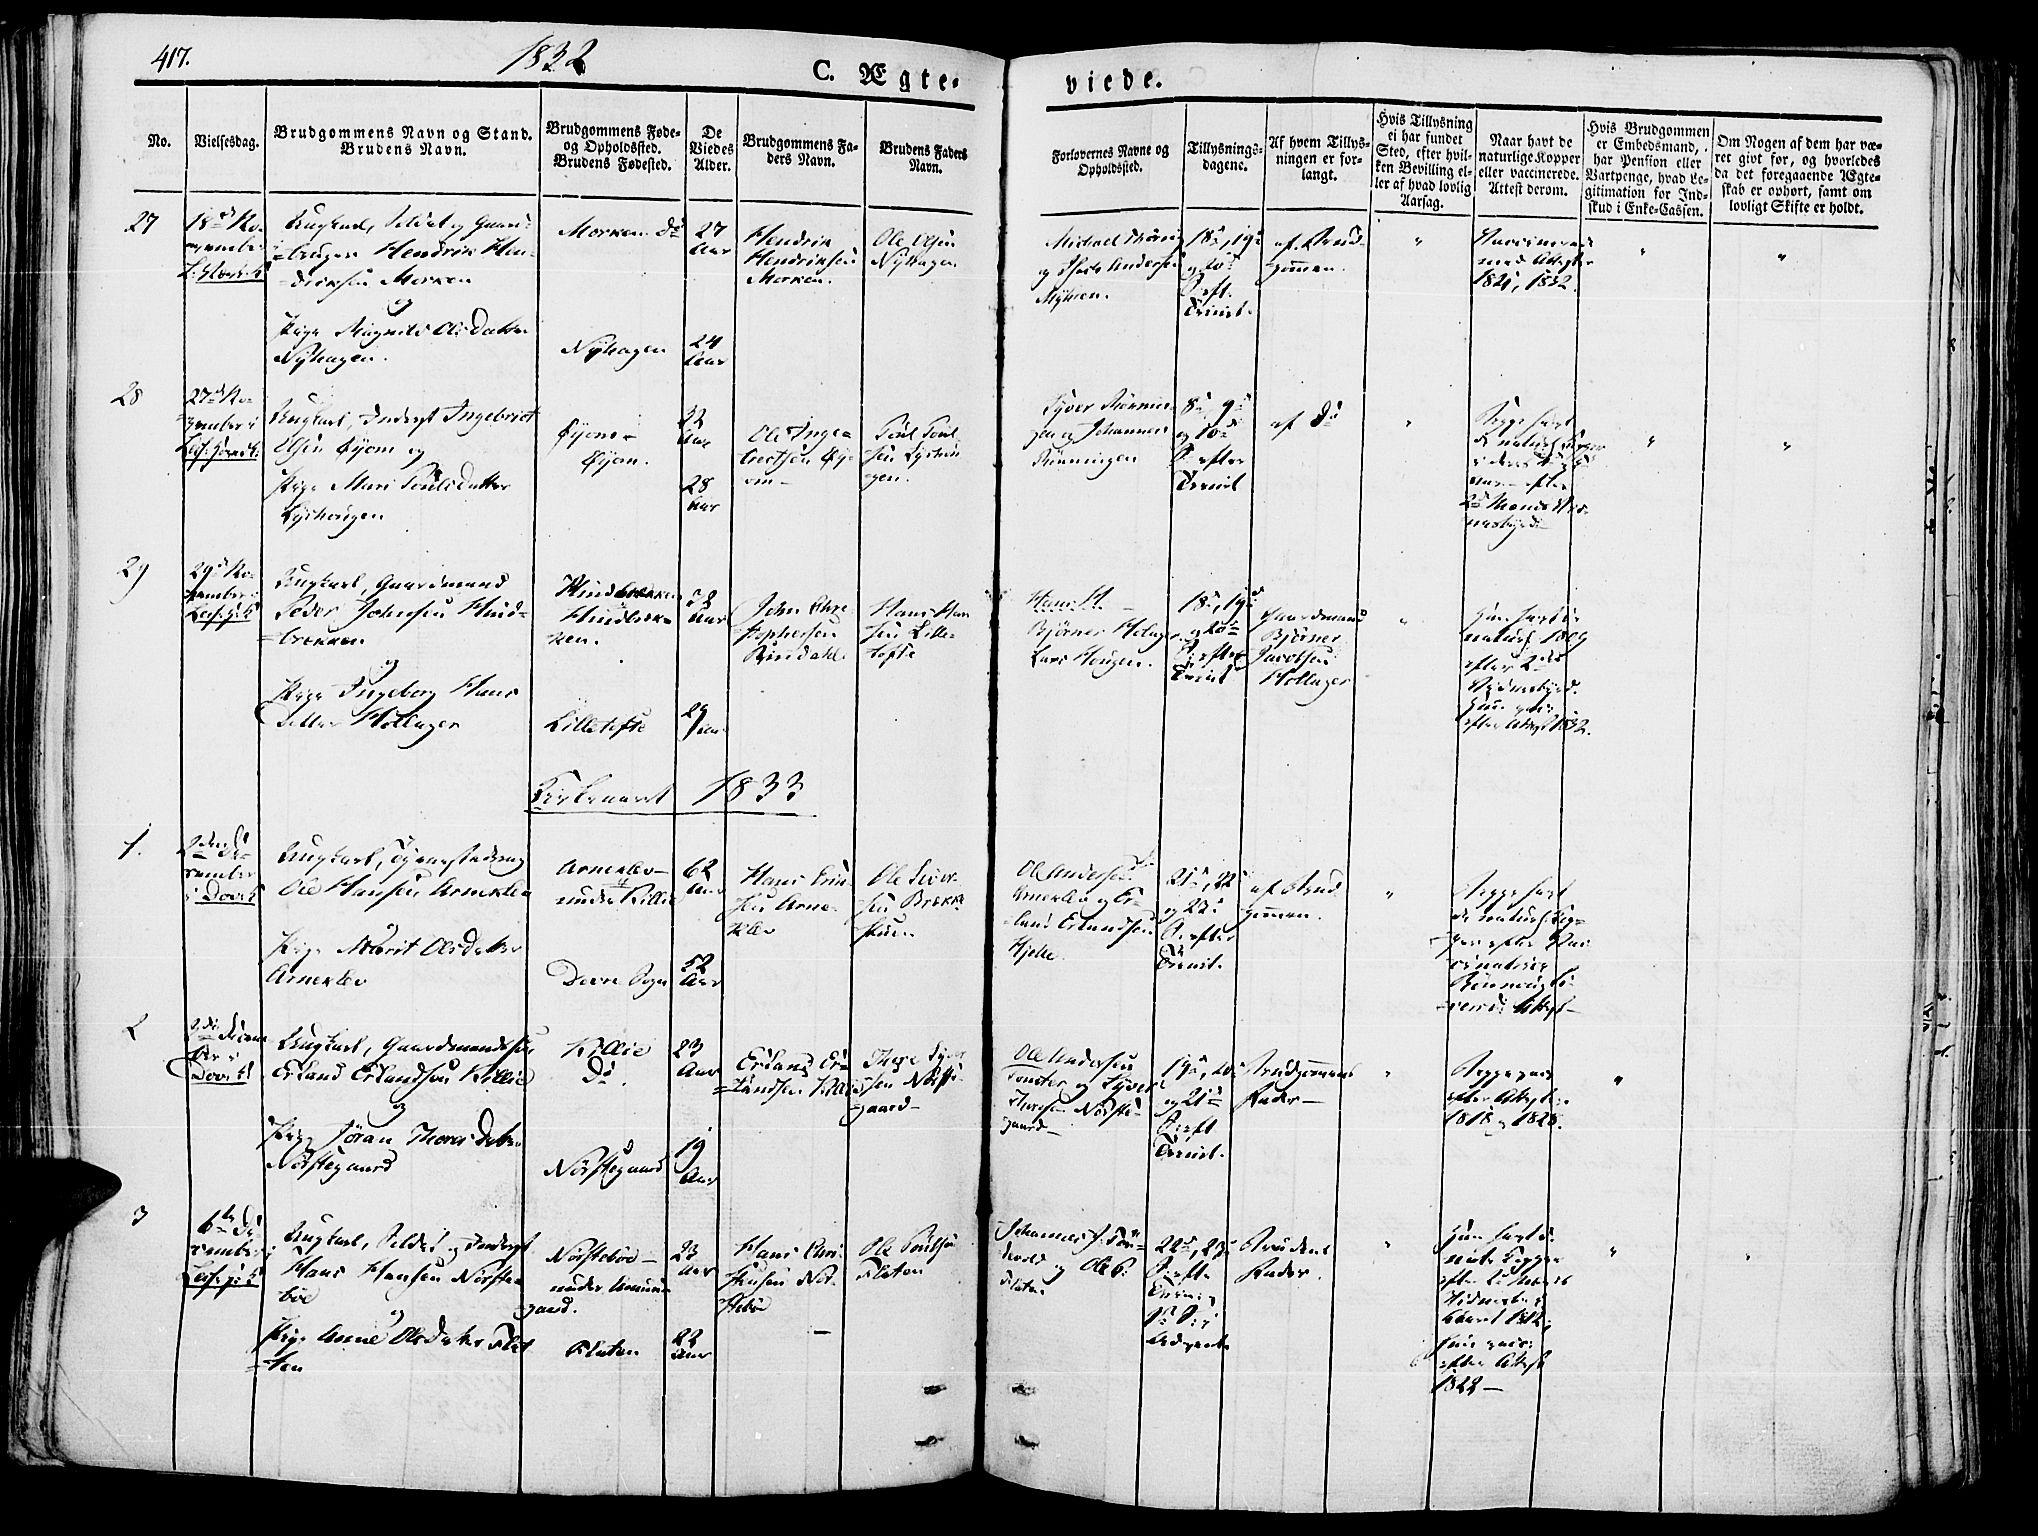 SAH, Lesja prestekontor, Ministerialbok nr. 5, 1830-1842, s. 417